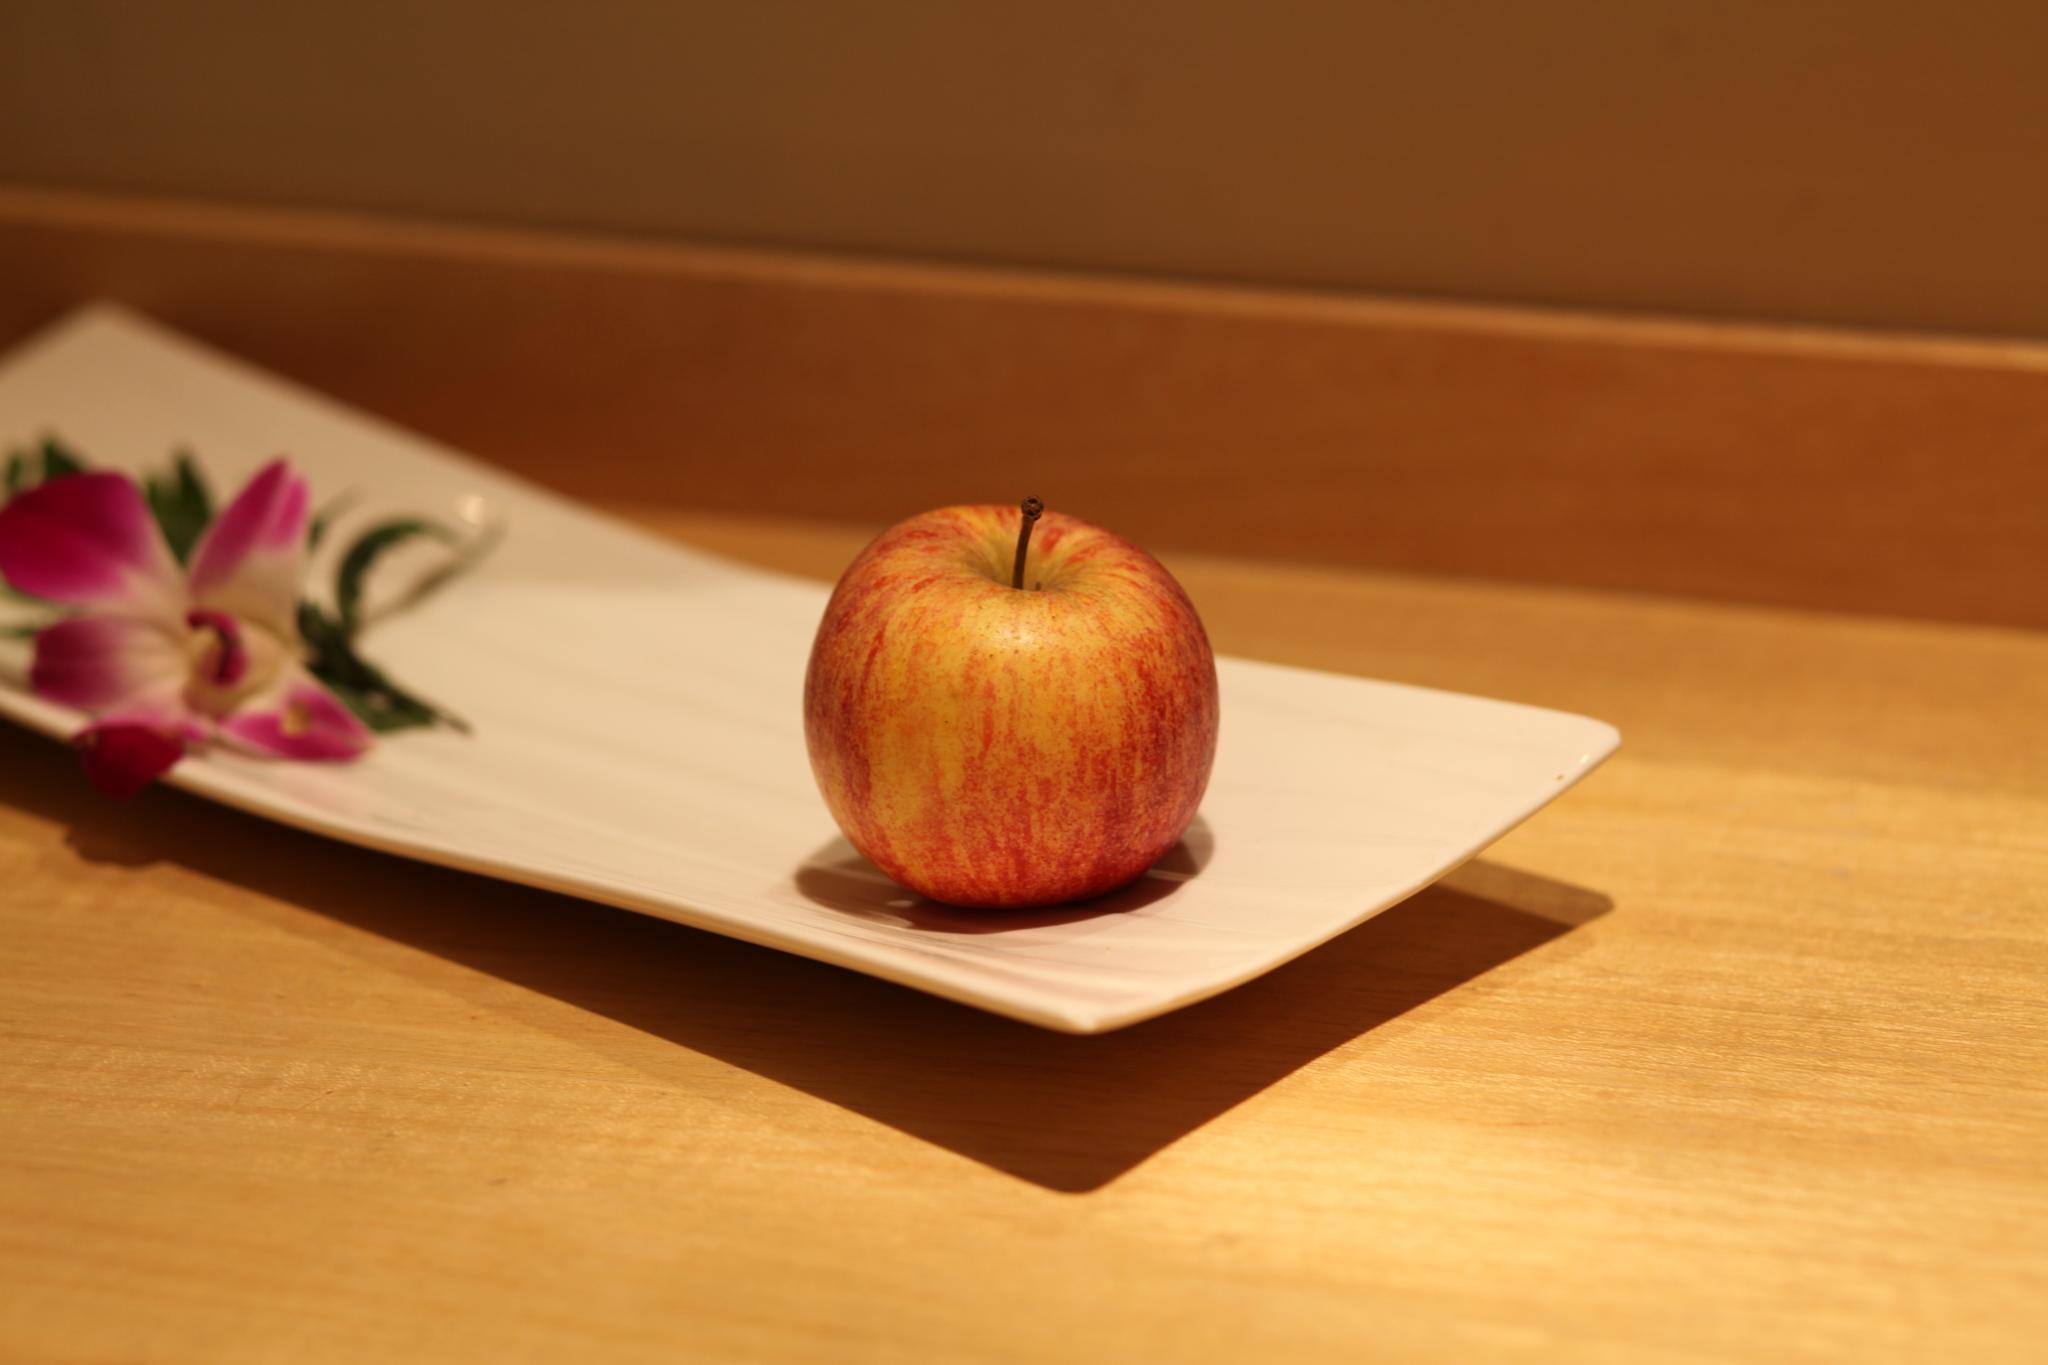 Apple by Anders Jonsson